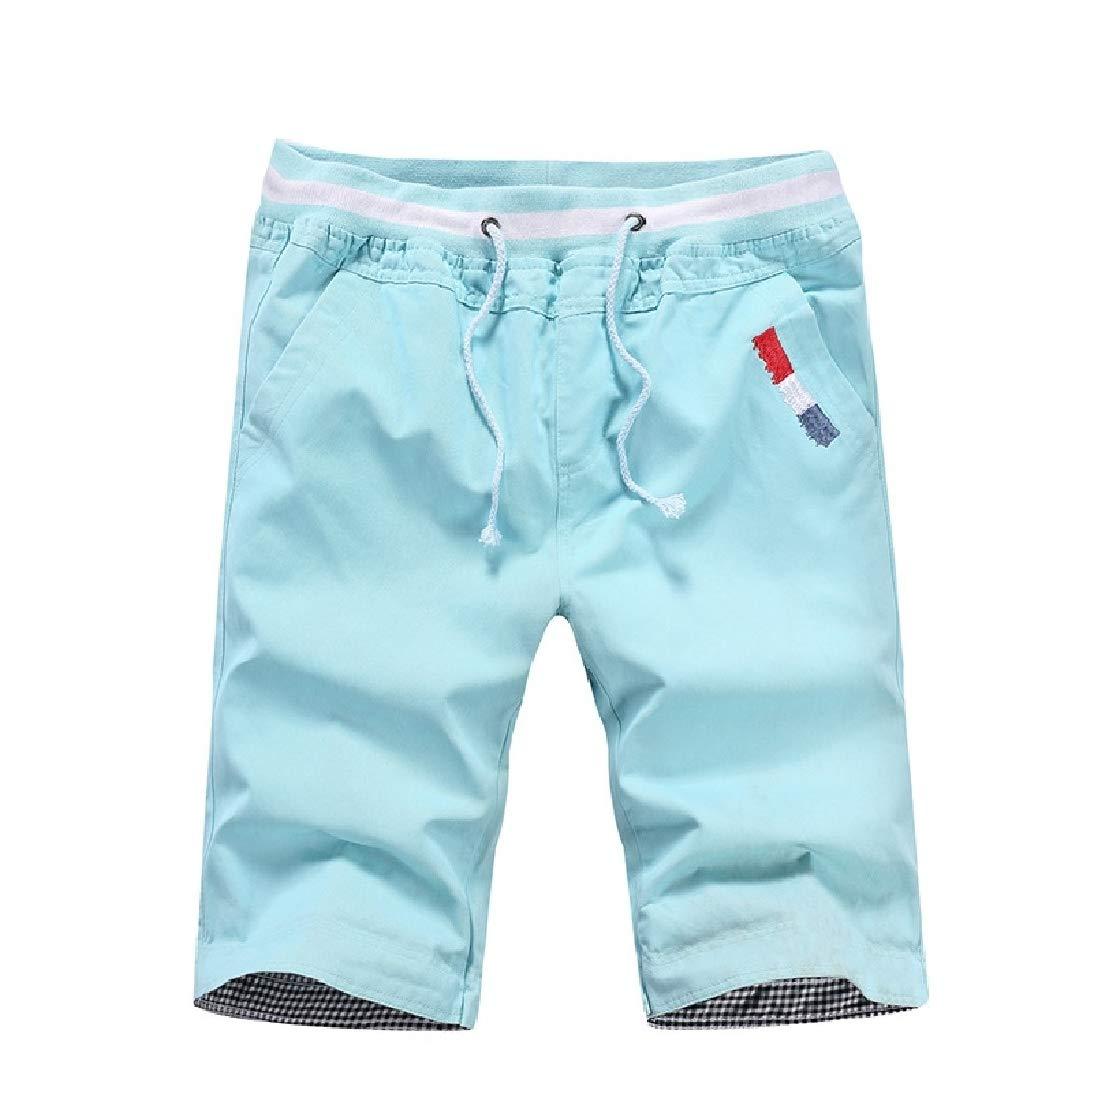 YUNY Men Leisure Straps Low-Waist 1//2 Length Board Shorts Beach Shorts AS2 2XL